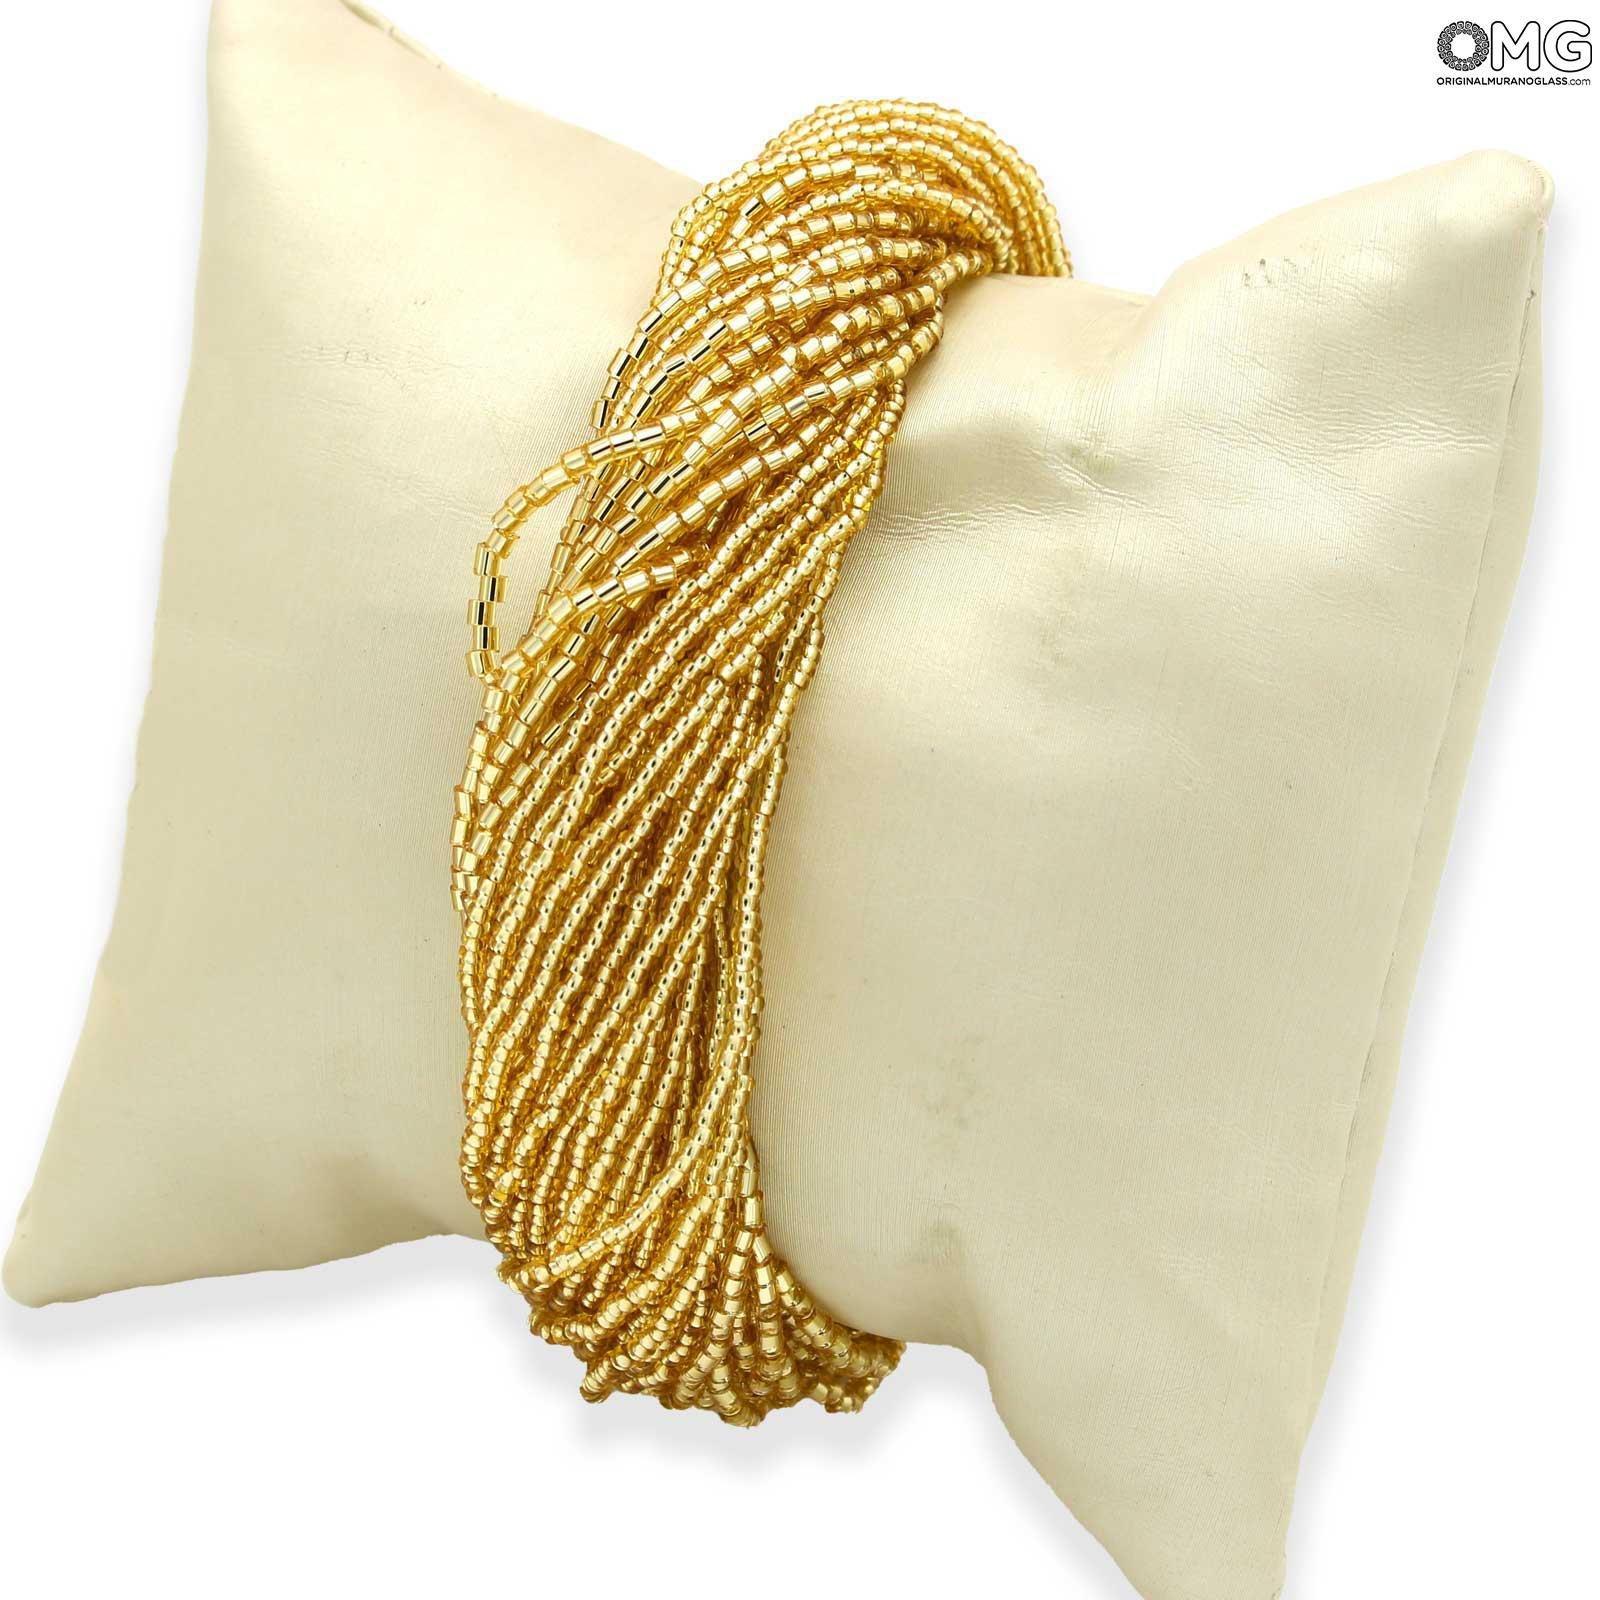 Bracelet Millefili Conterie - Gold - Original Murano Glass OMG®